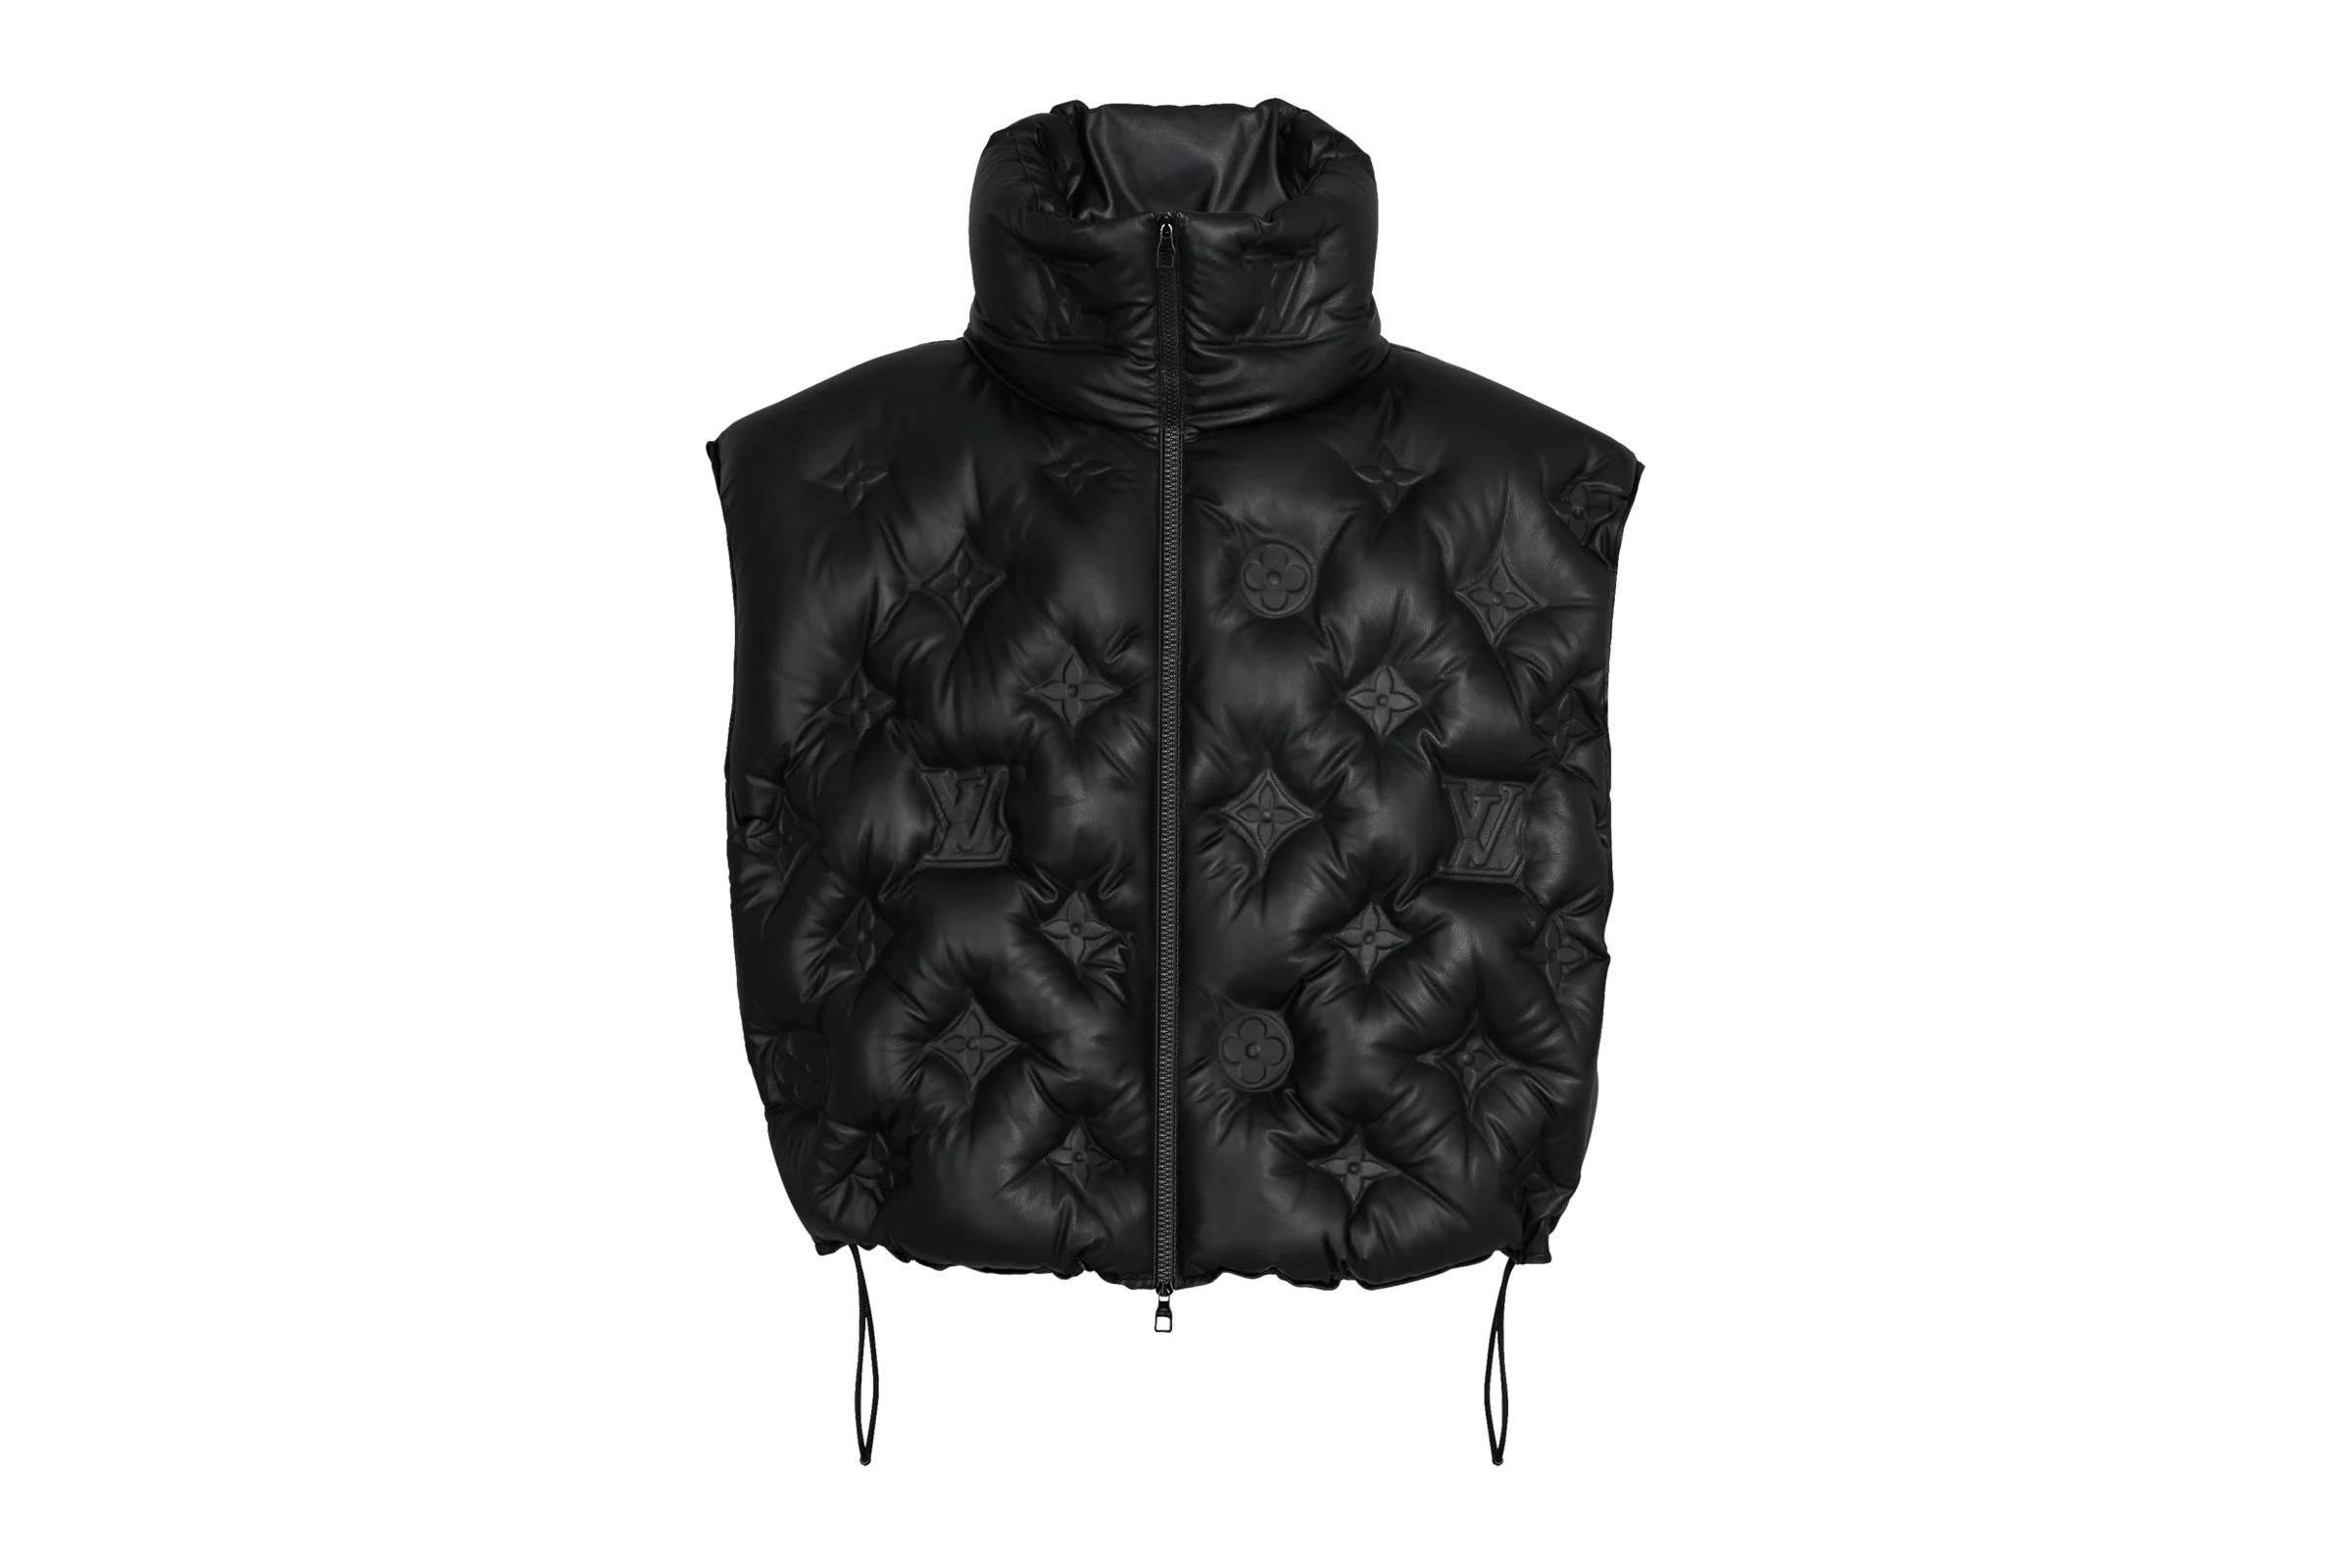 Louis Vuitton Fall/Winter 2019 Monogram Boyhood Puffer Leather Vest